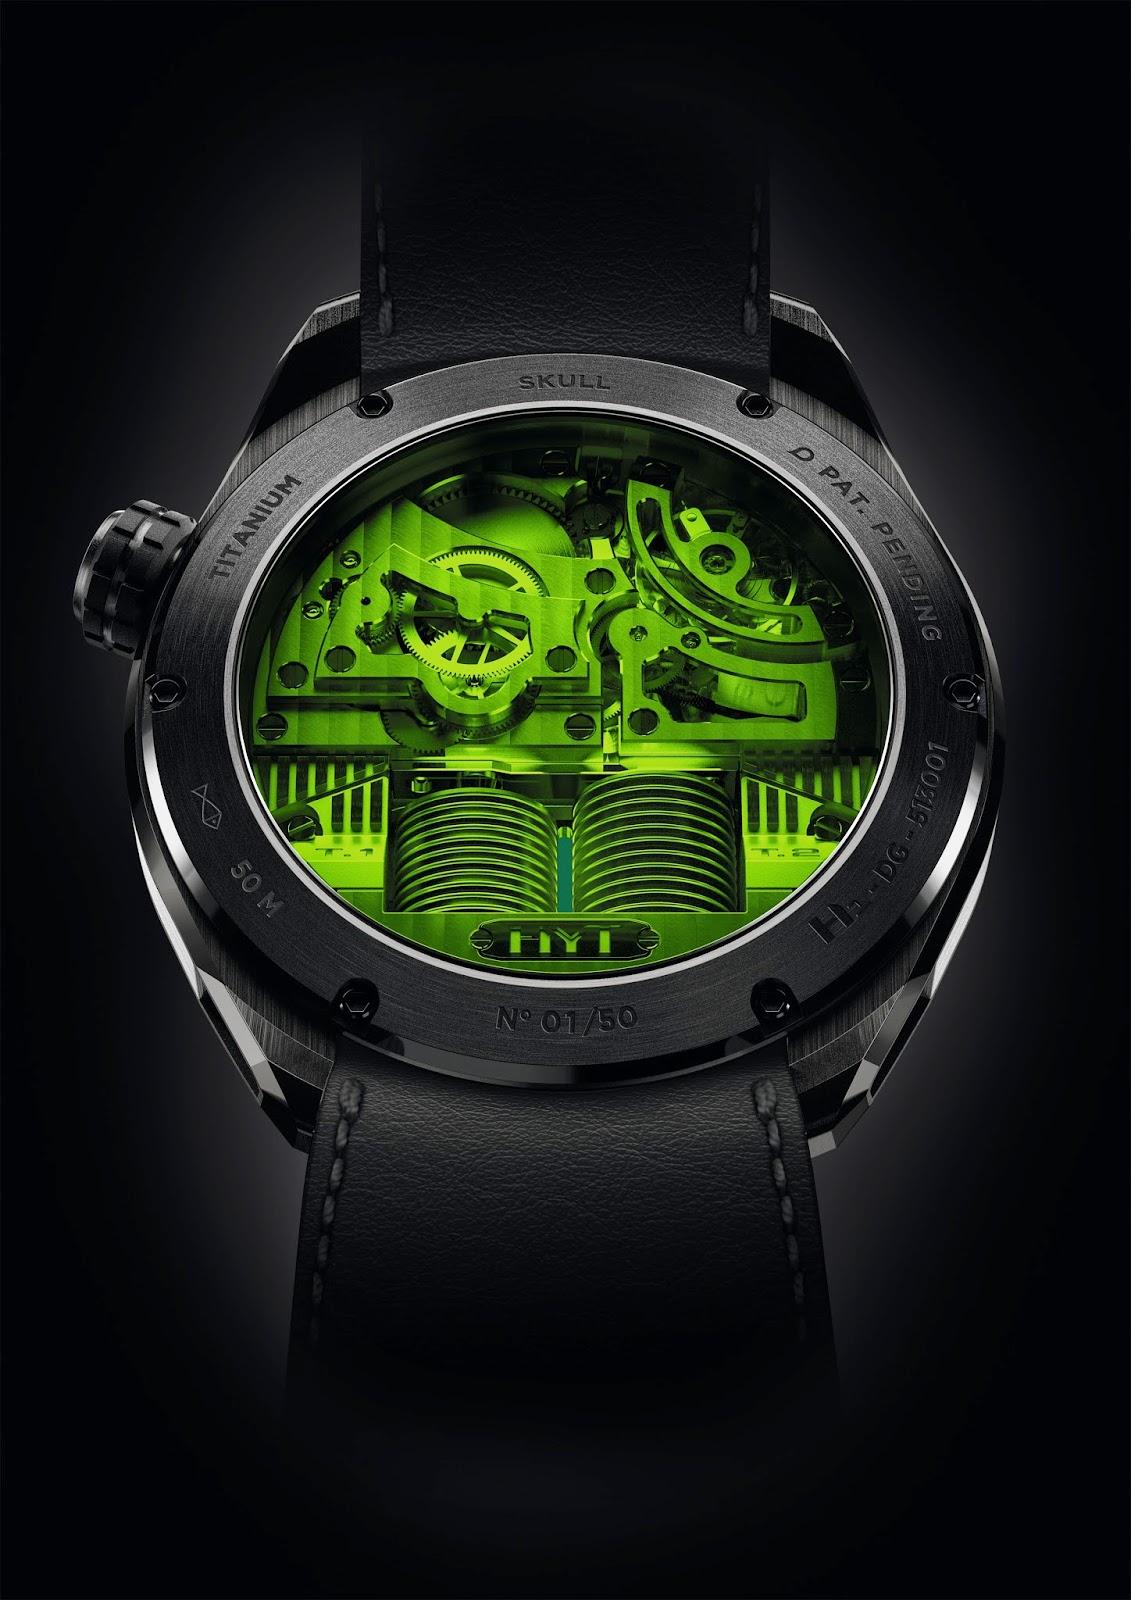 Hyt Skull Green Eye Pre Basel 2015B